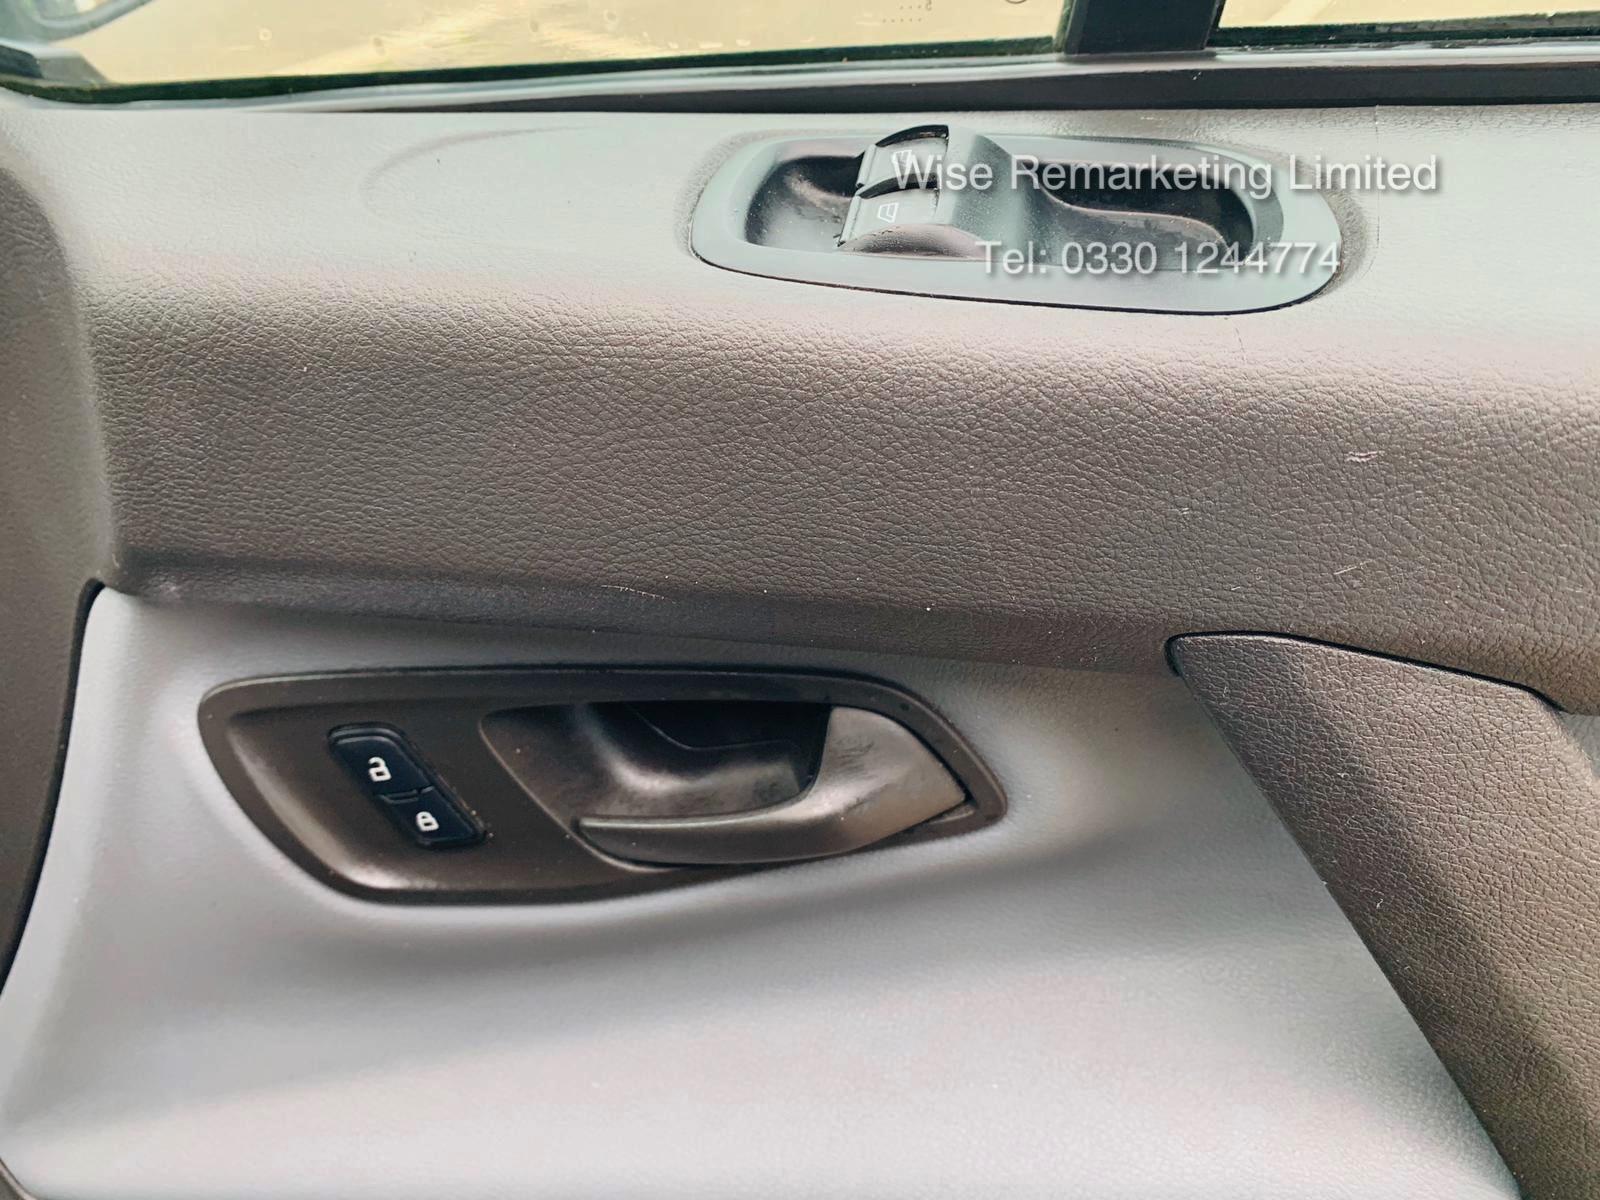 Ford Transit Custom 2.2 TDCI 290 **HIGH ROOF** - 2016 Model - AIR CON- 1 OWNER- FSH- RARE VAN!! - Image 19 of 24